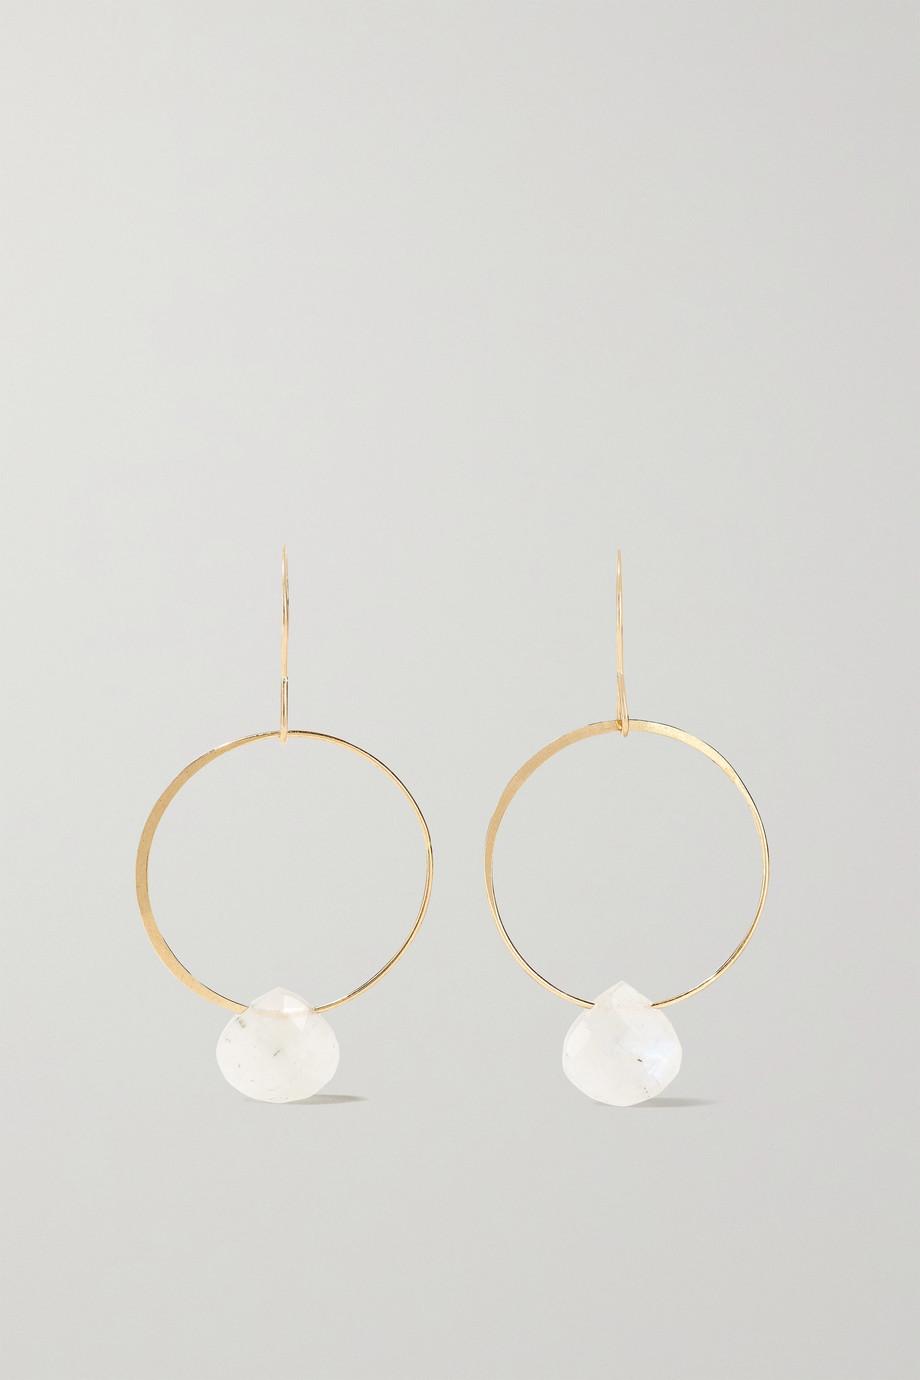 Melissa Joy Manning 14-karat recycled gold moonstone earrings